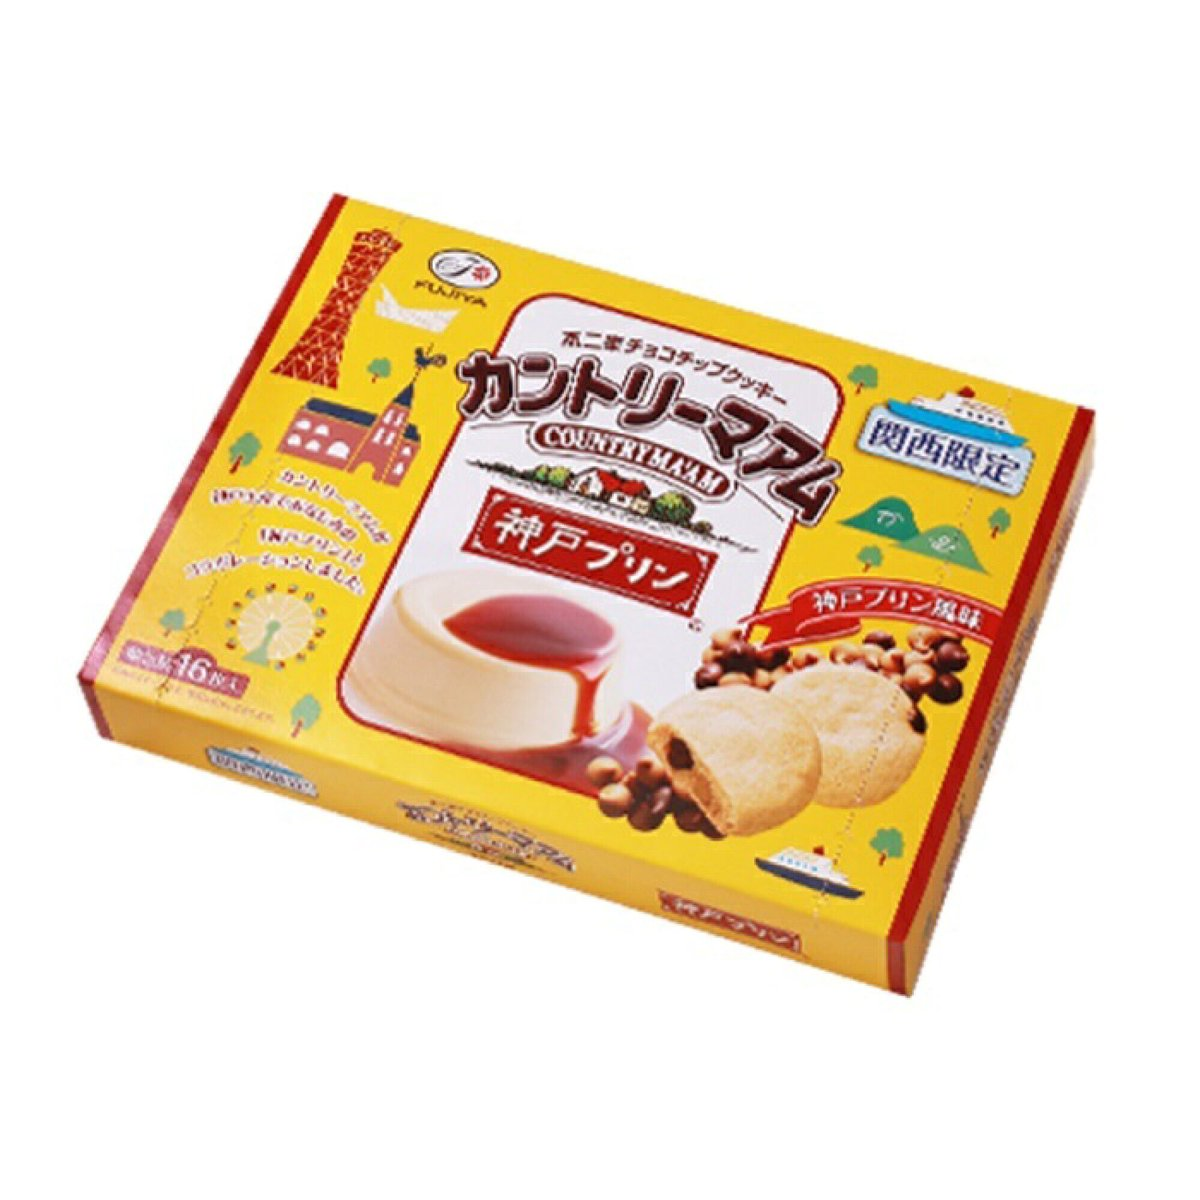 test ツイッターメディア - 神戸プリン風味カントリーマアム、そろそろ買いたい。関西限定と言いつつ姫路で見た事ないから神戸や大阪に行かないと無いんだよなぁ https://t.co/dXtQPW2ZTO